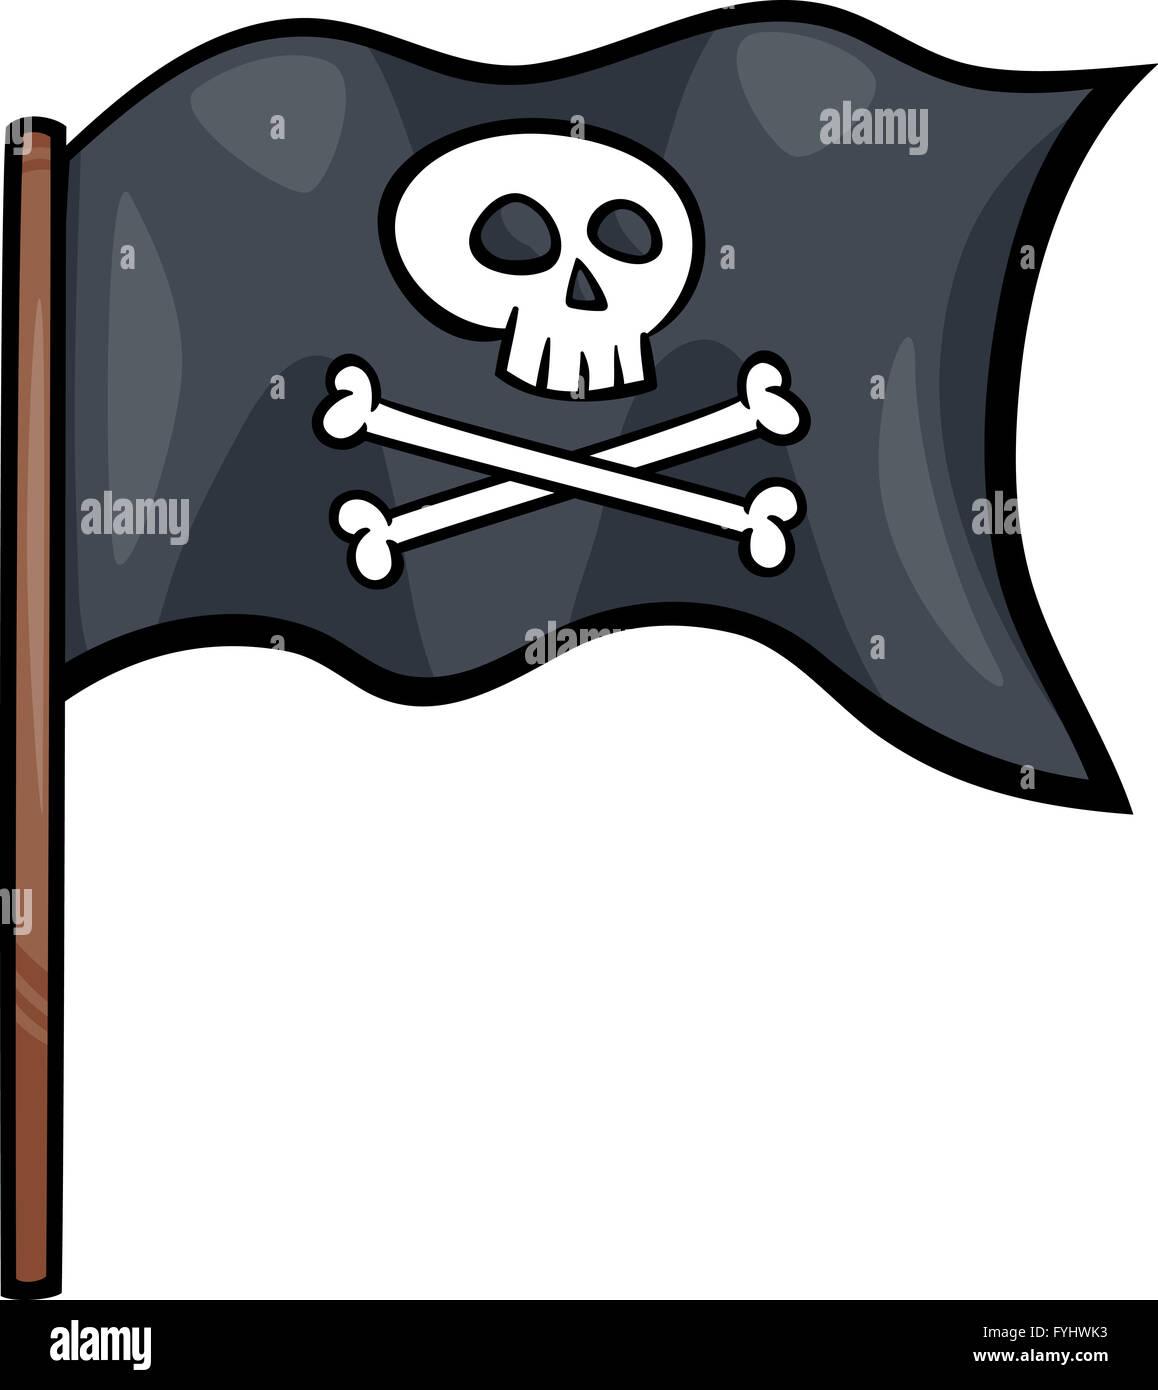 pirate flag cartoon clip art stock photo 103040871 alamy rh alamy com pirate flag clip art black and white pirate ship flag clipart